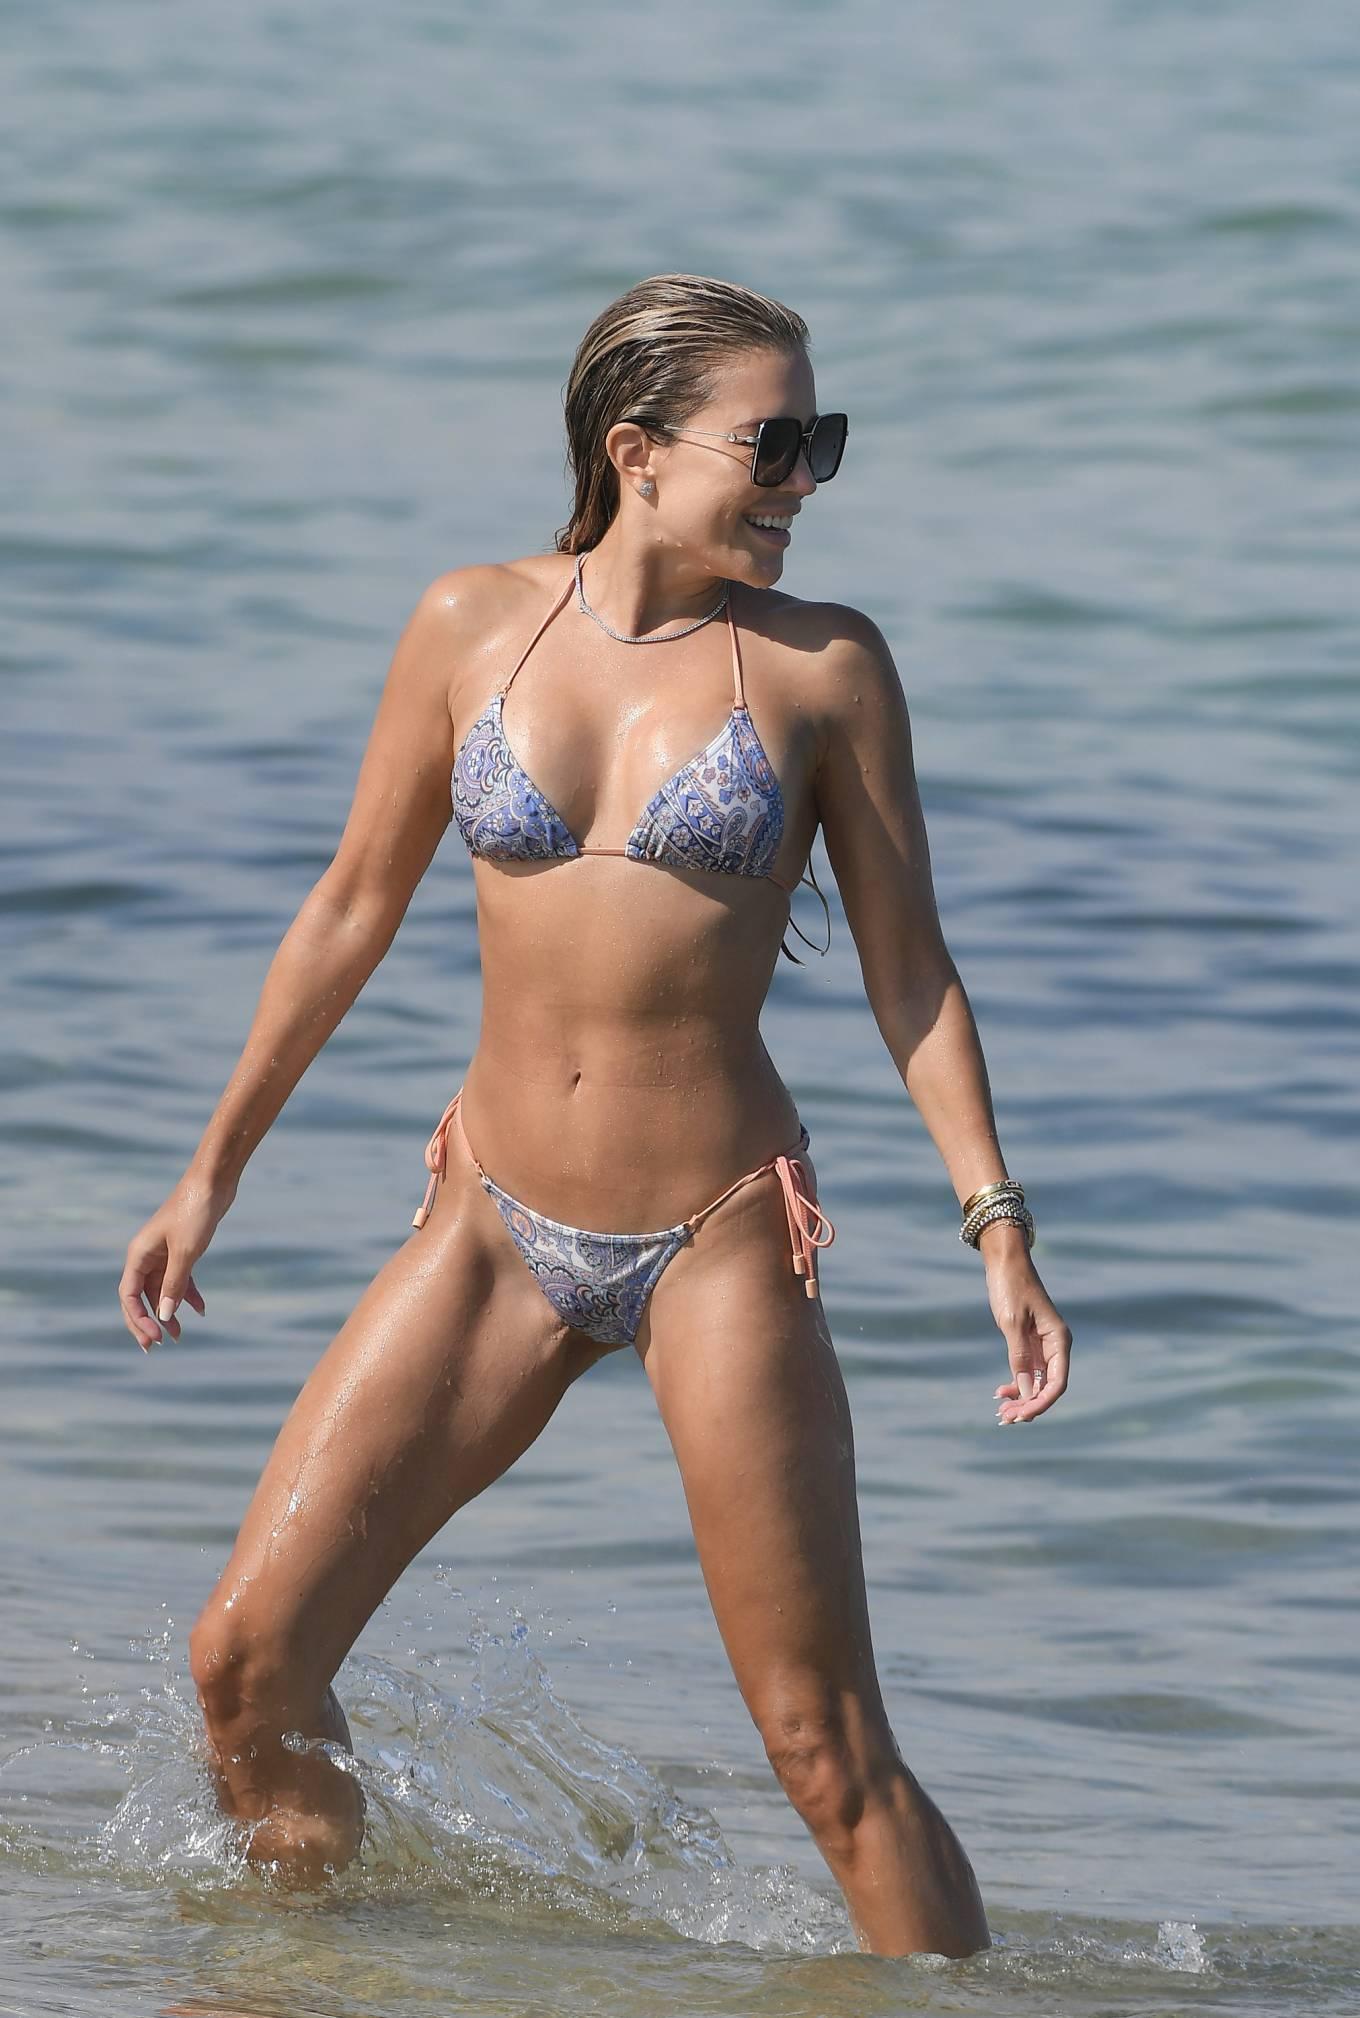 Sylvie Meis 2021 : Sylvie Meis – In a bikini with her husband Niclas Castello on the beach La Réserve in Ramatuelle-24